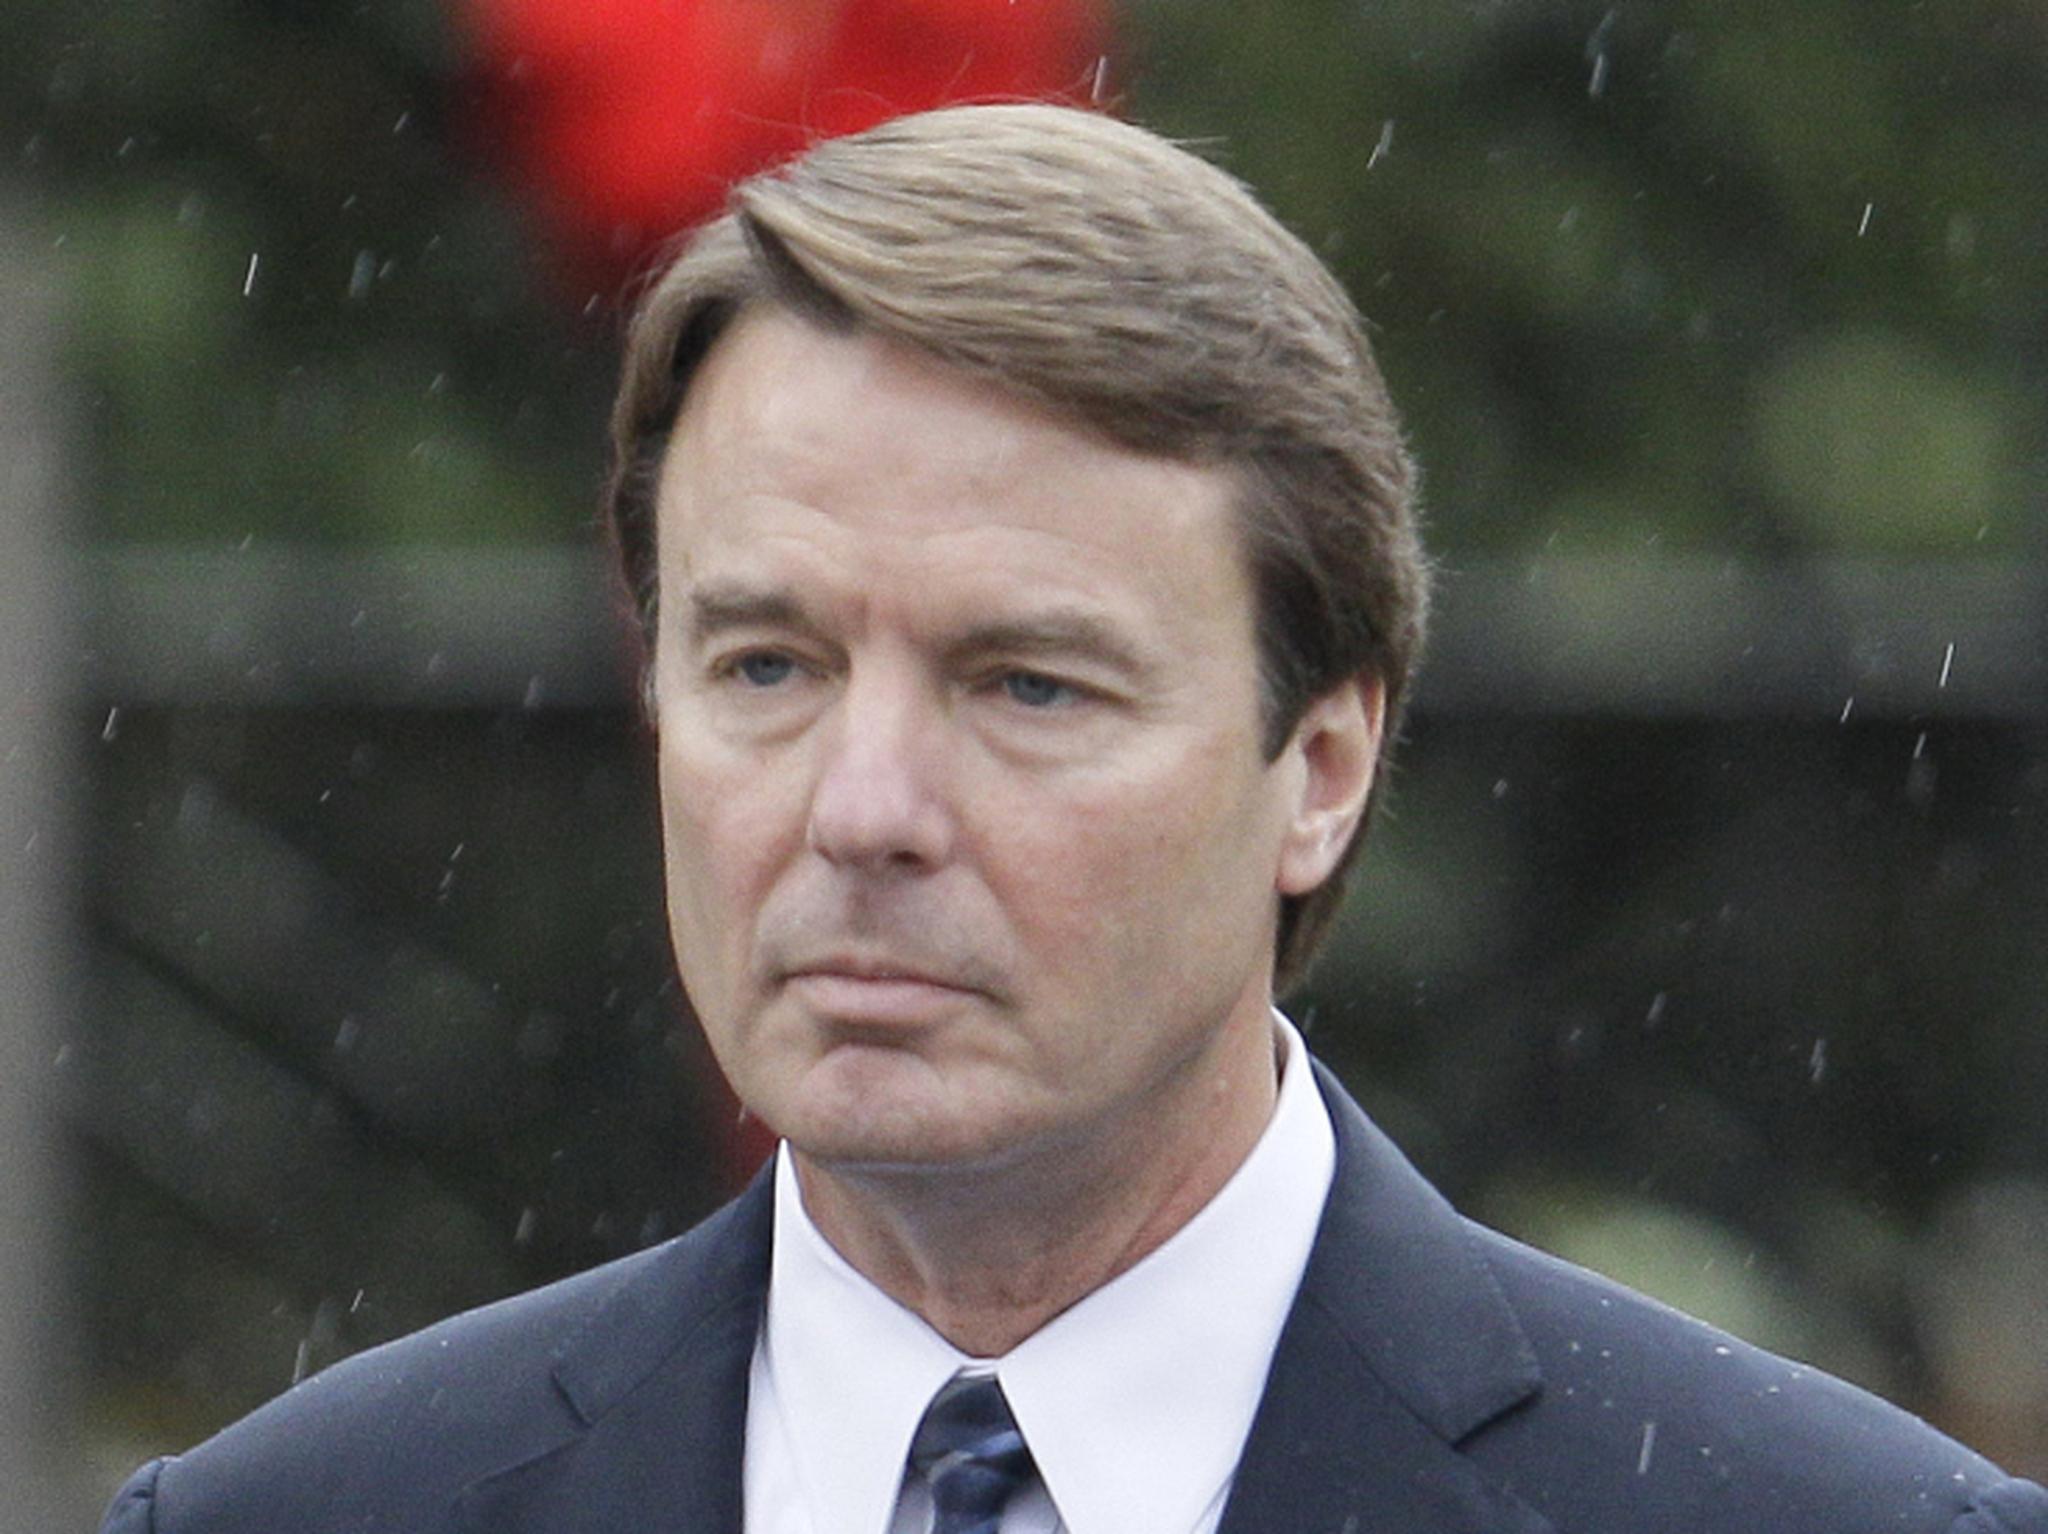 John Edwards extramarital affair